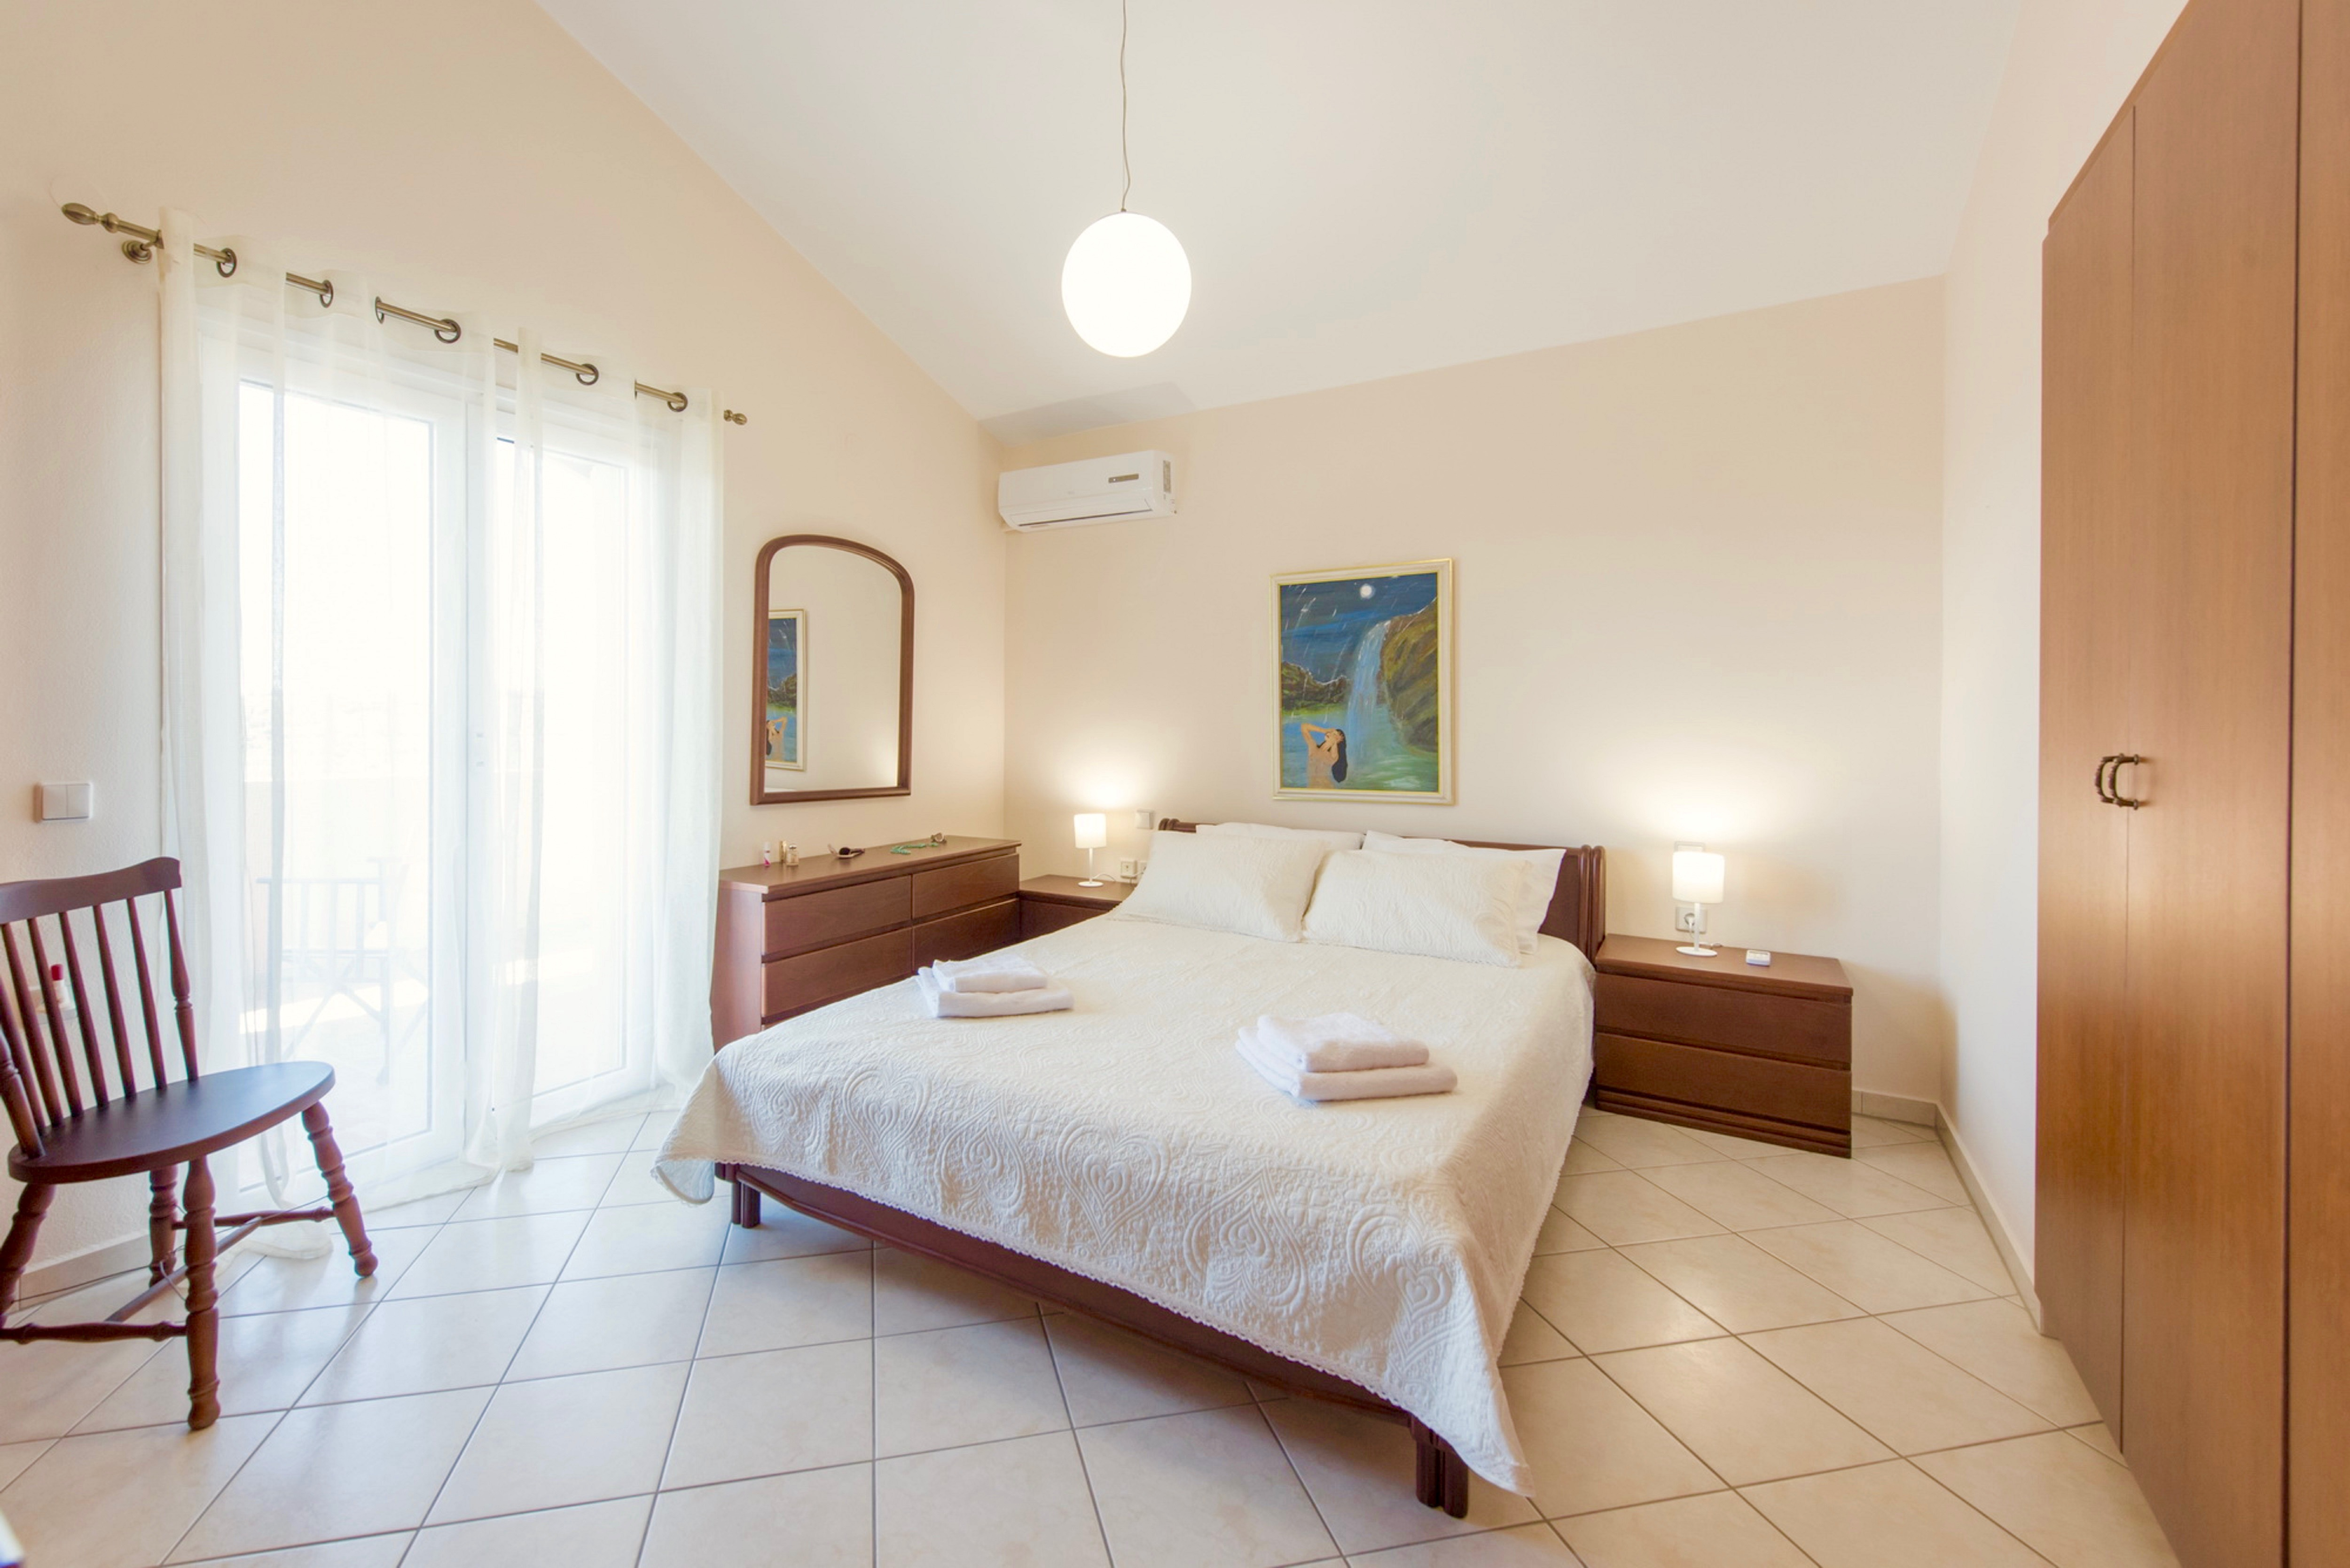 Ferienhaus Luxury Villa Korini with private swimming pool (2470495), Roumeli, Kreta Nordküste, Kreta, Griechenland, Bild 43